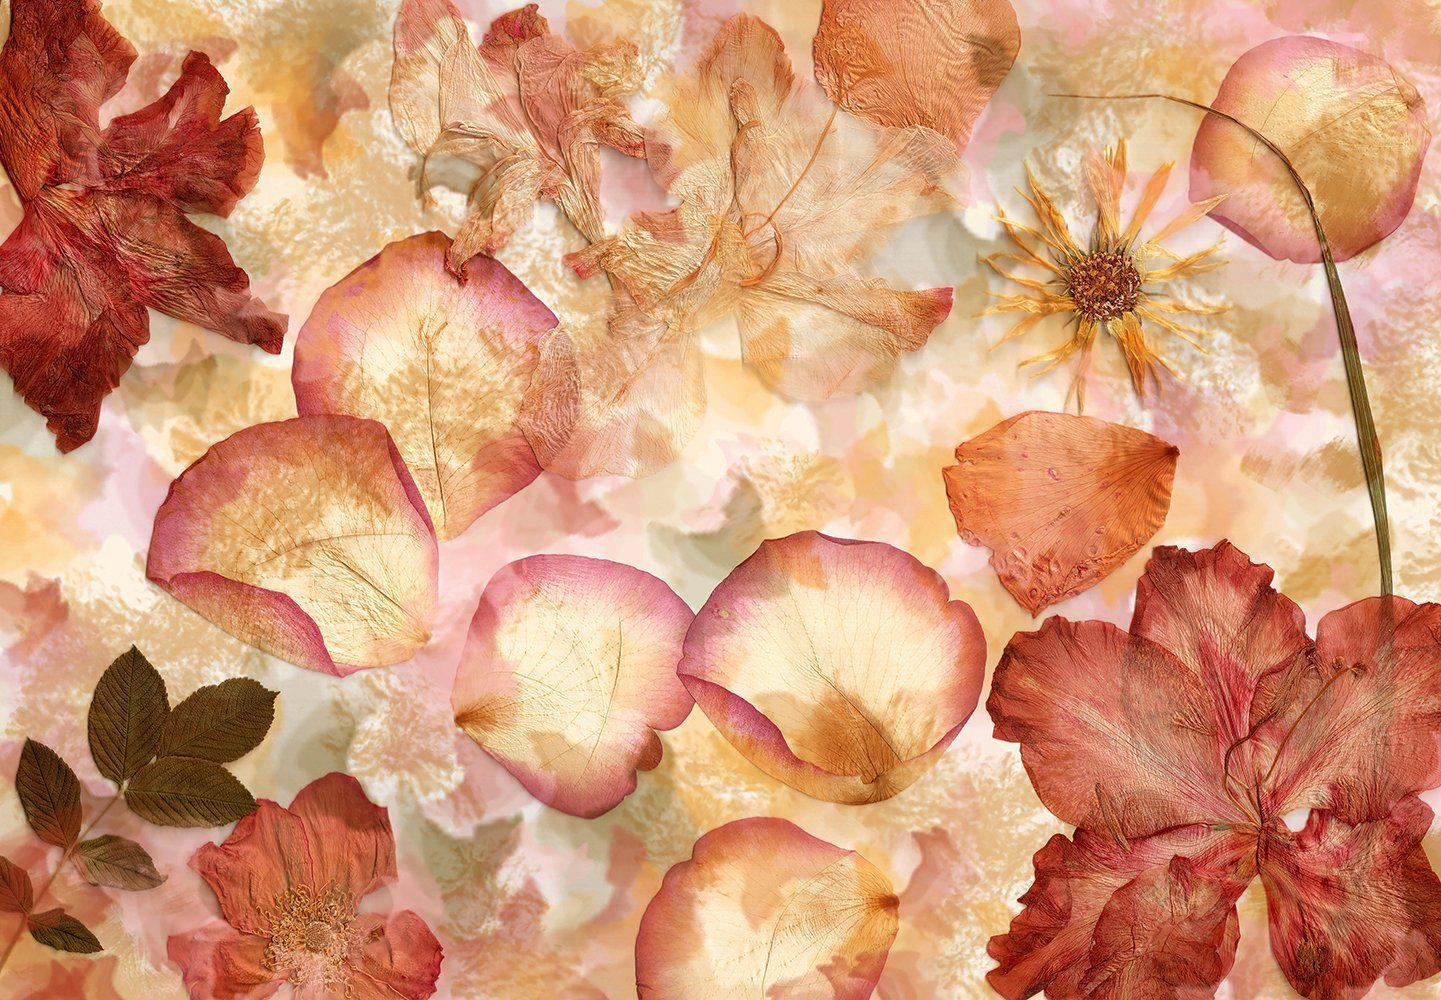 Vliestapete »Dried Flowers«, 366x254cm, 8-teilig